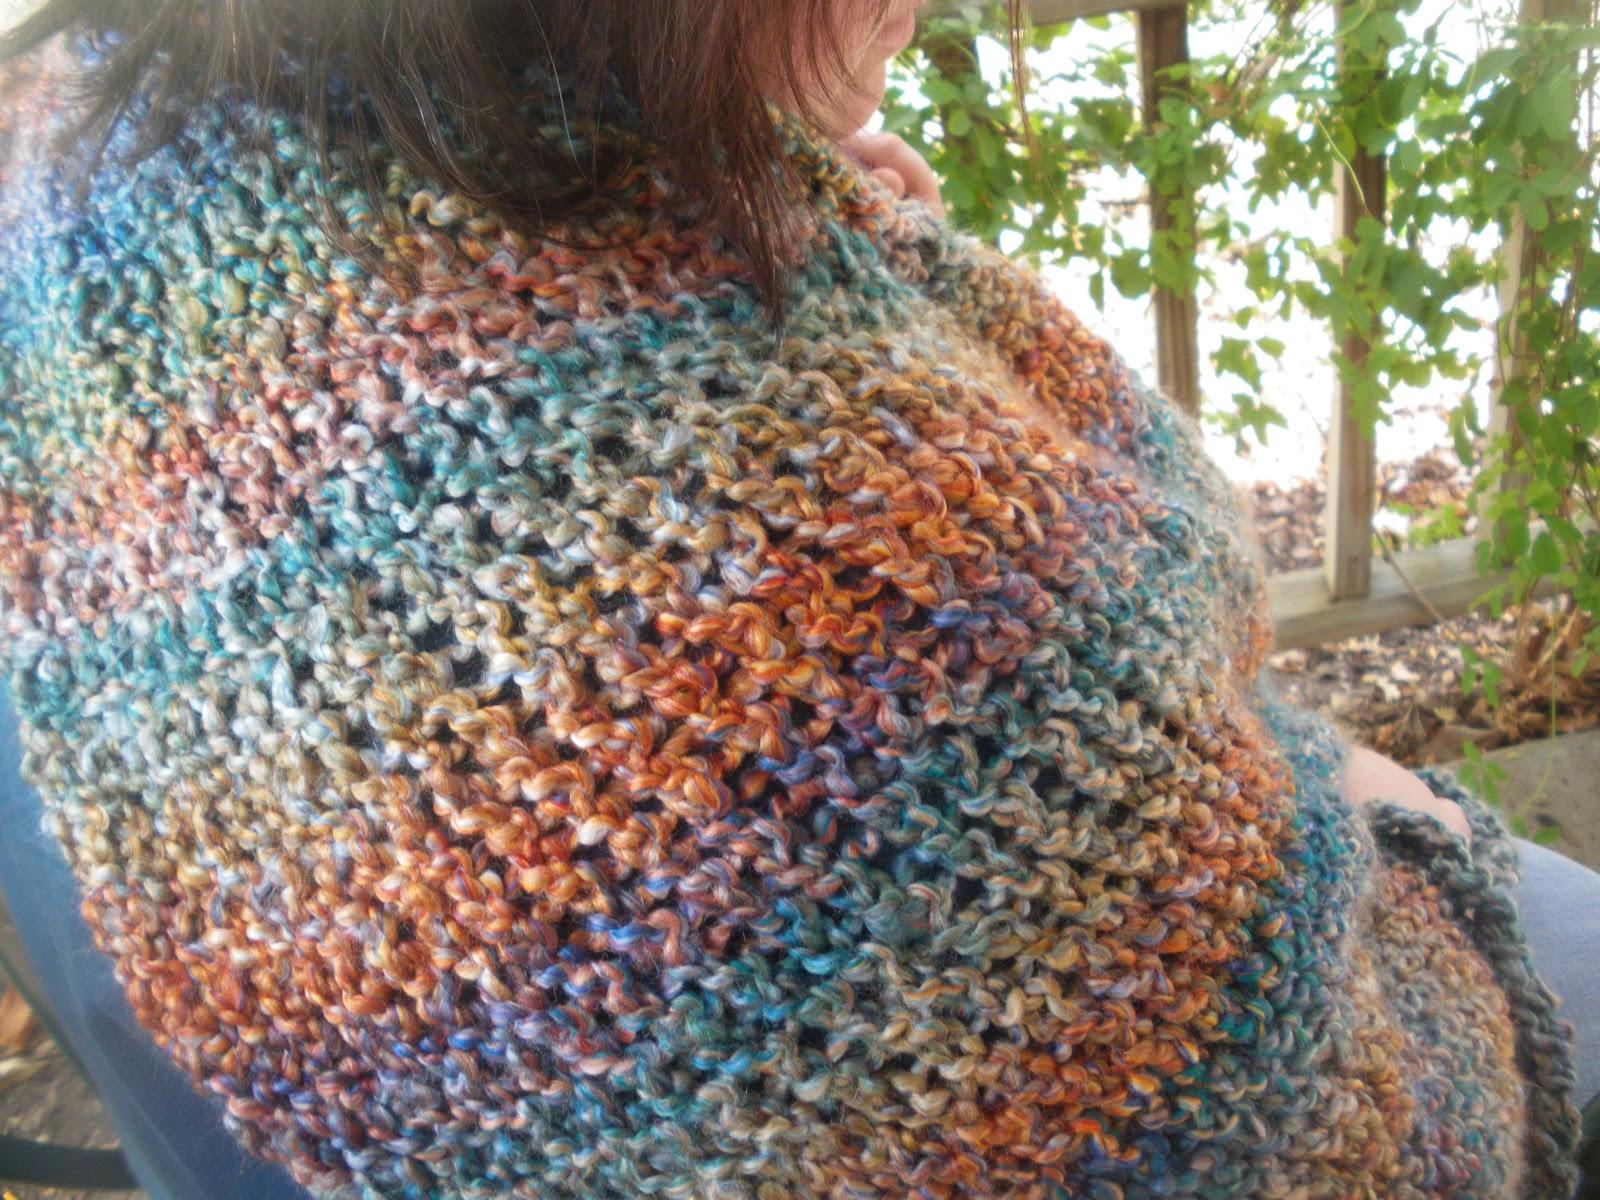 Elliott Crafty Creations: Mosaic Monday: Loom Knitting Prayer Shawls